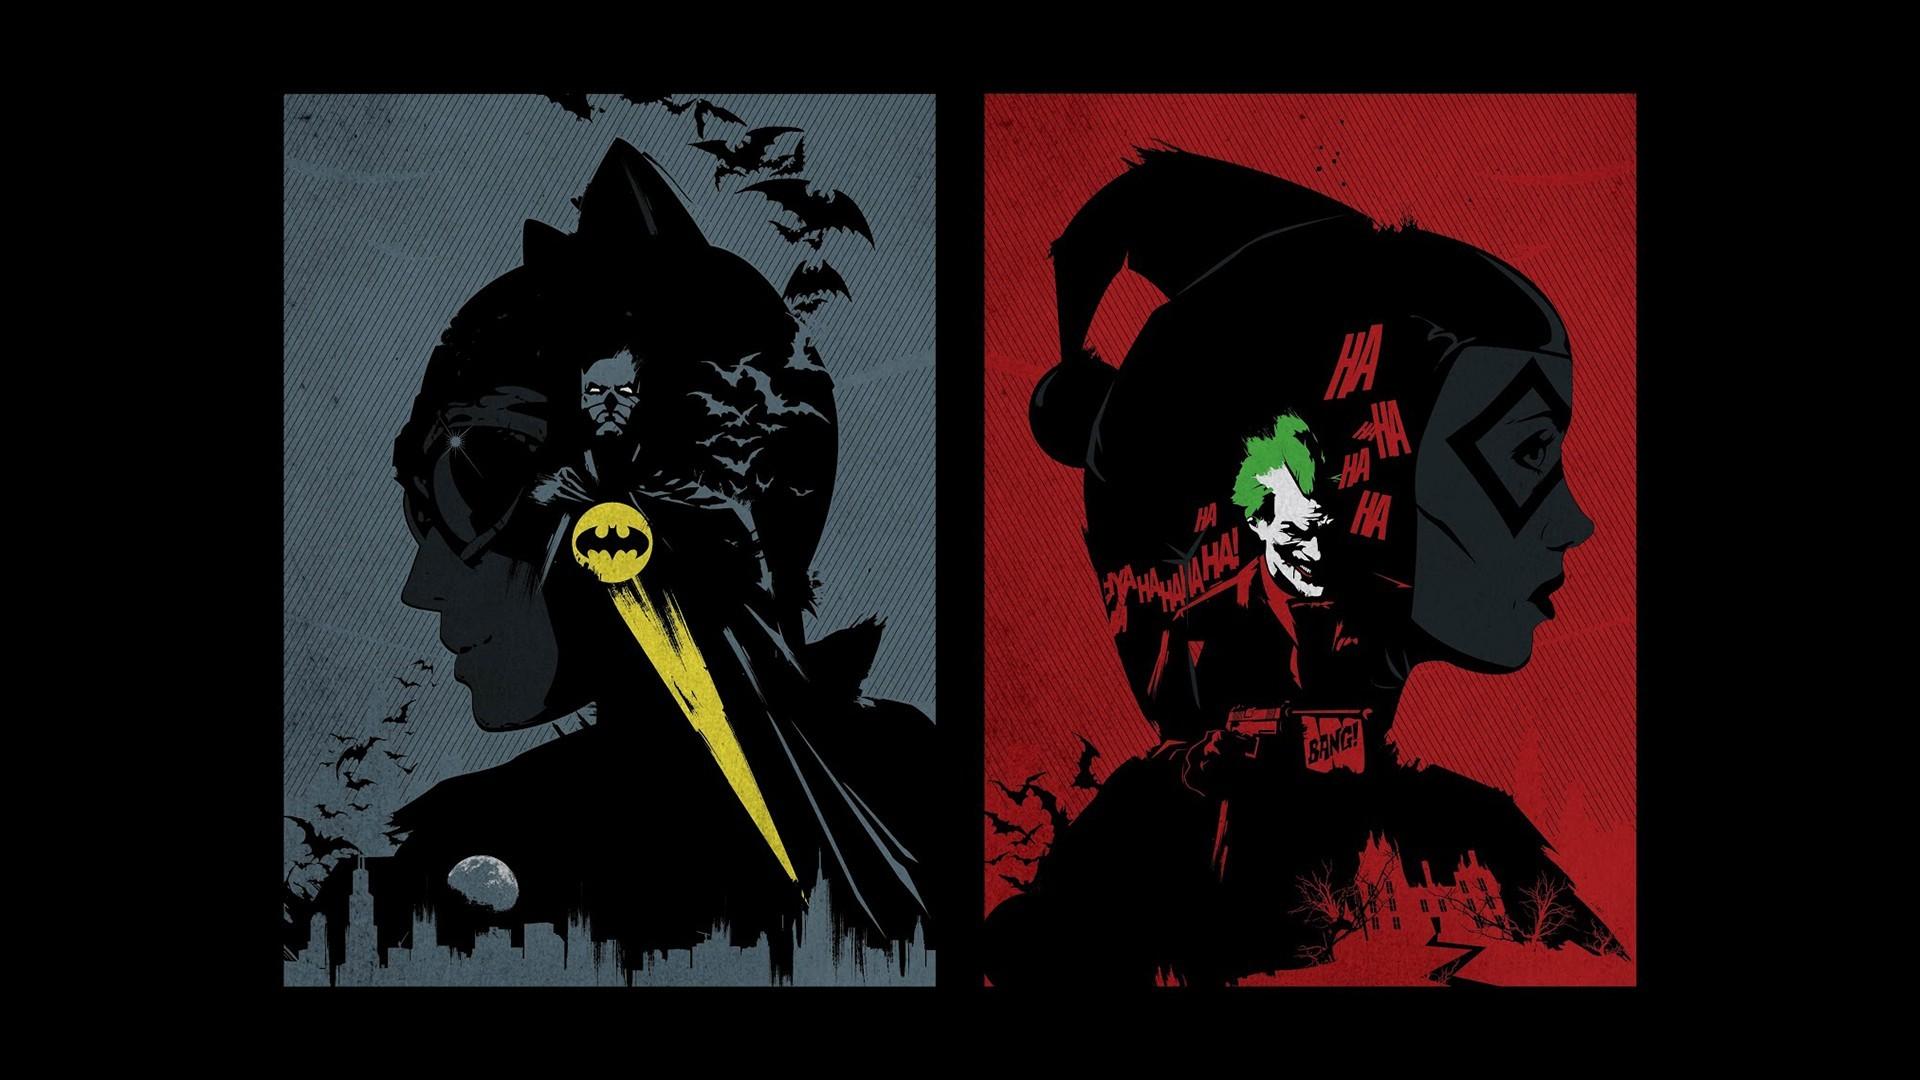 Catwoman vs Harley Quinn wallpaper 14566 1920x1080